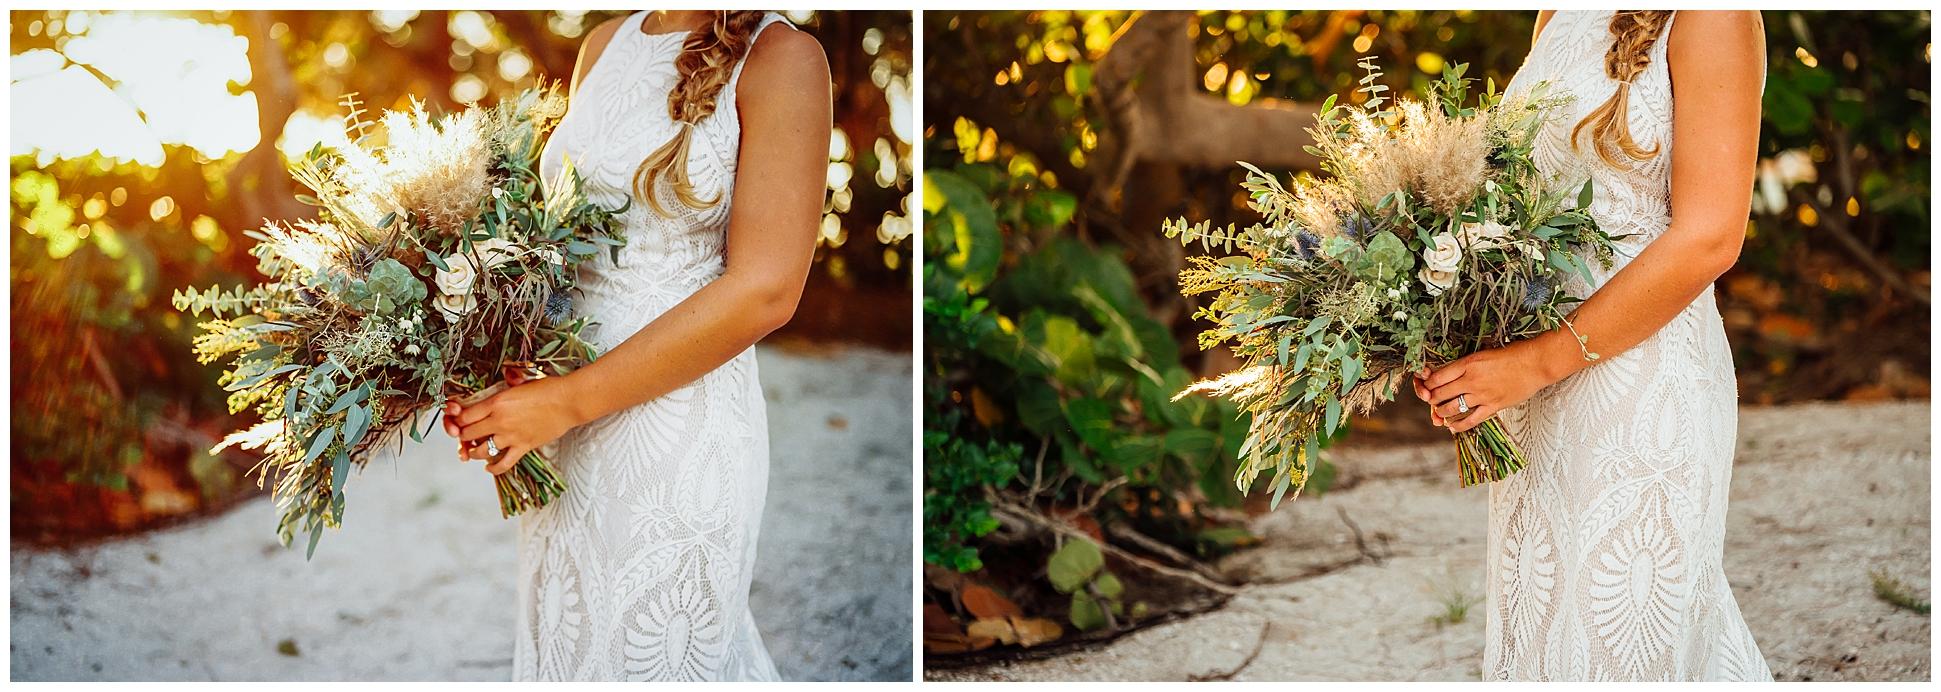 medium-format-film-vs-digital-wedding-photography-florida-beach_0020.jpg